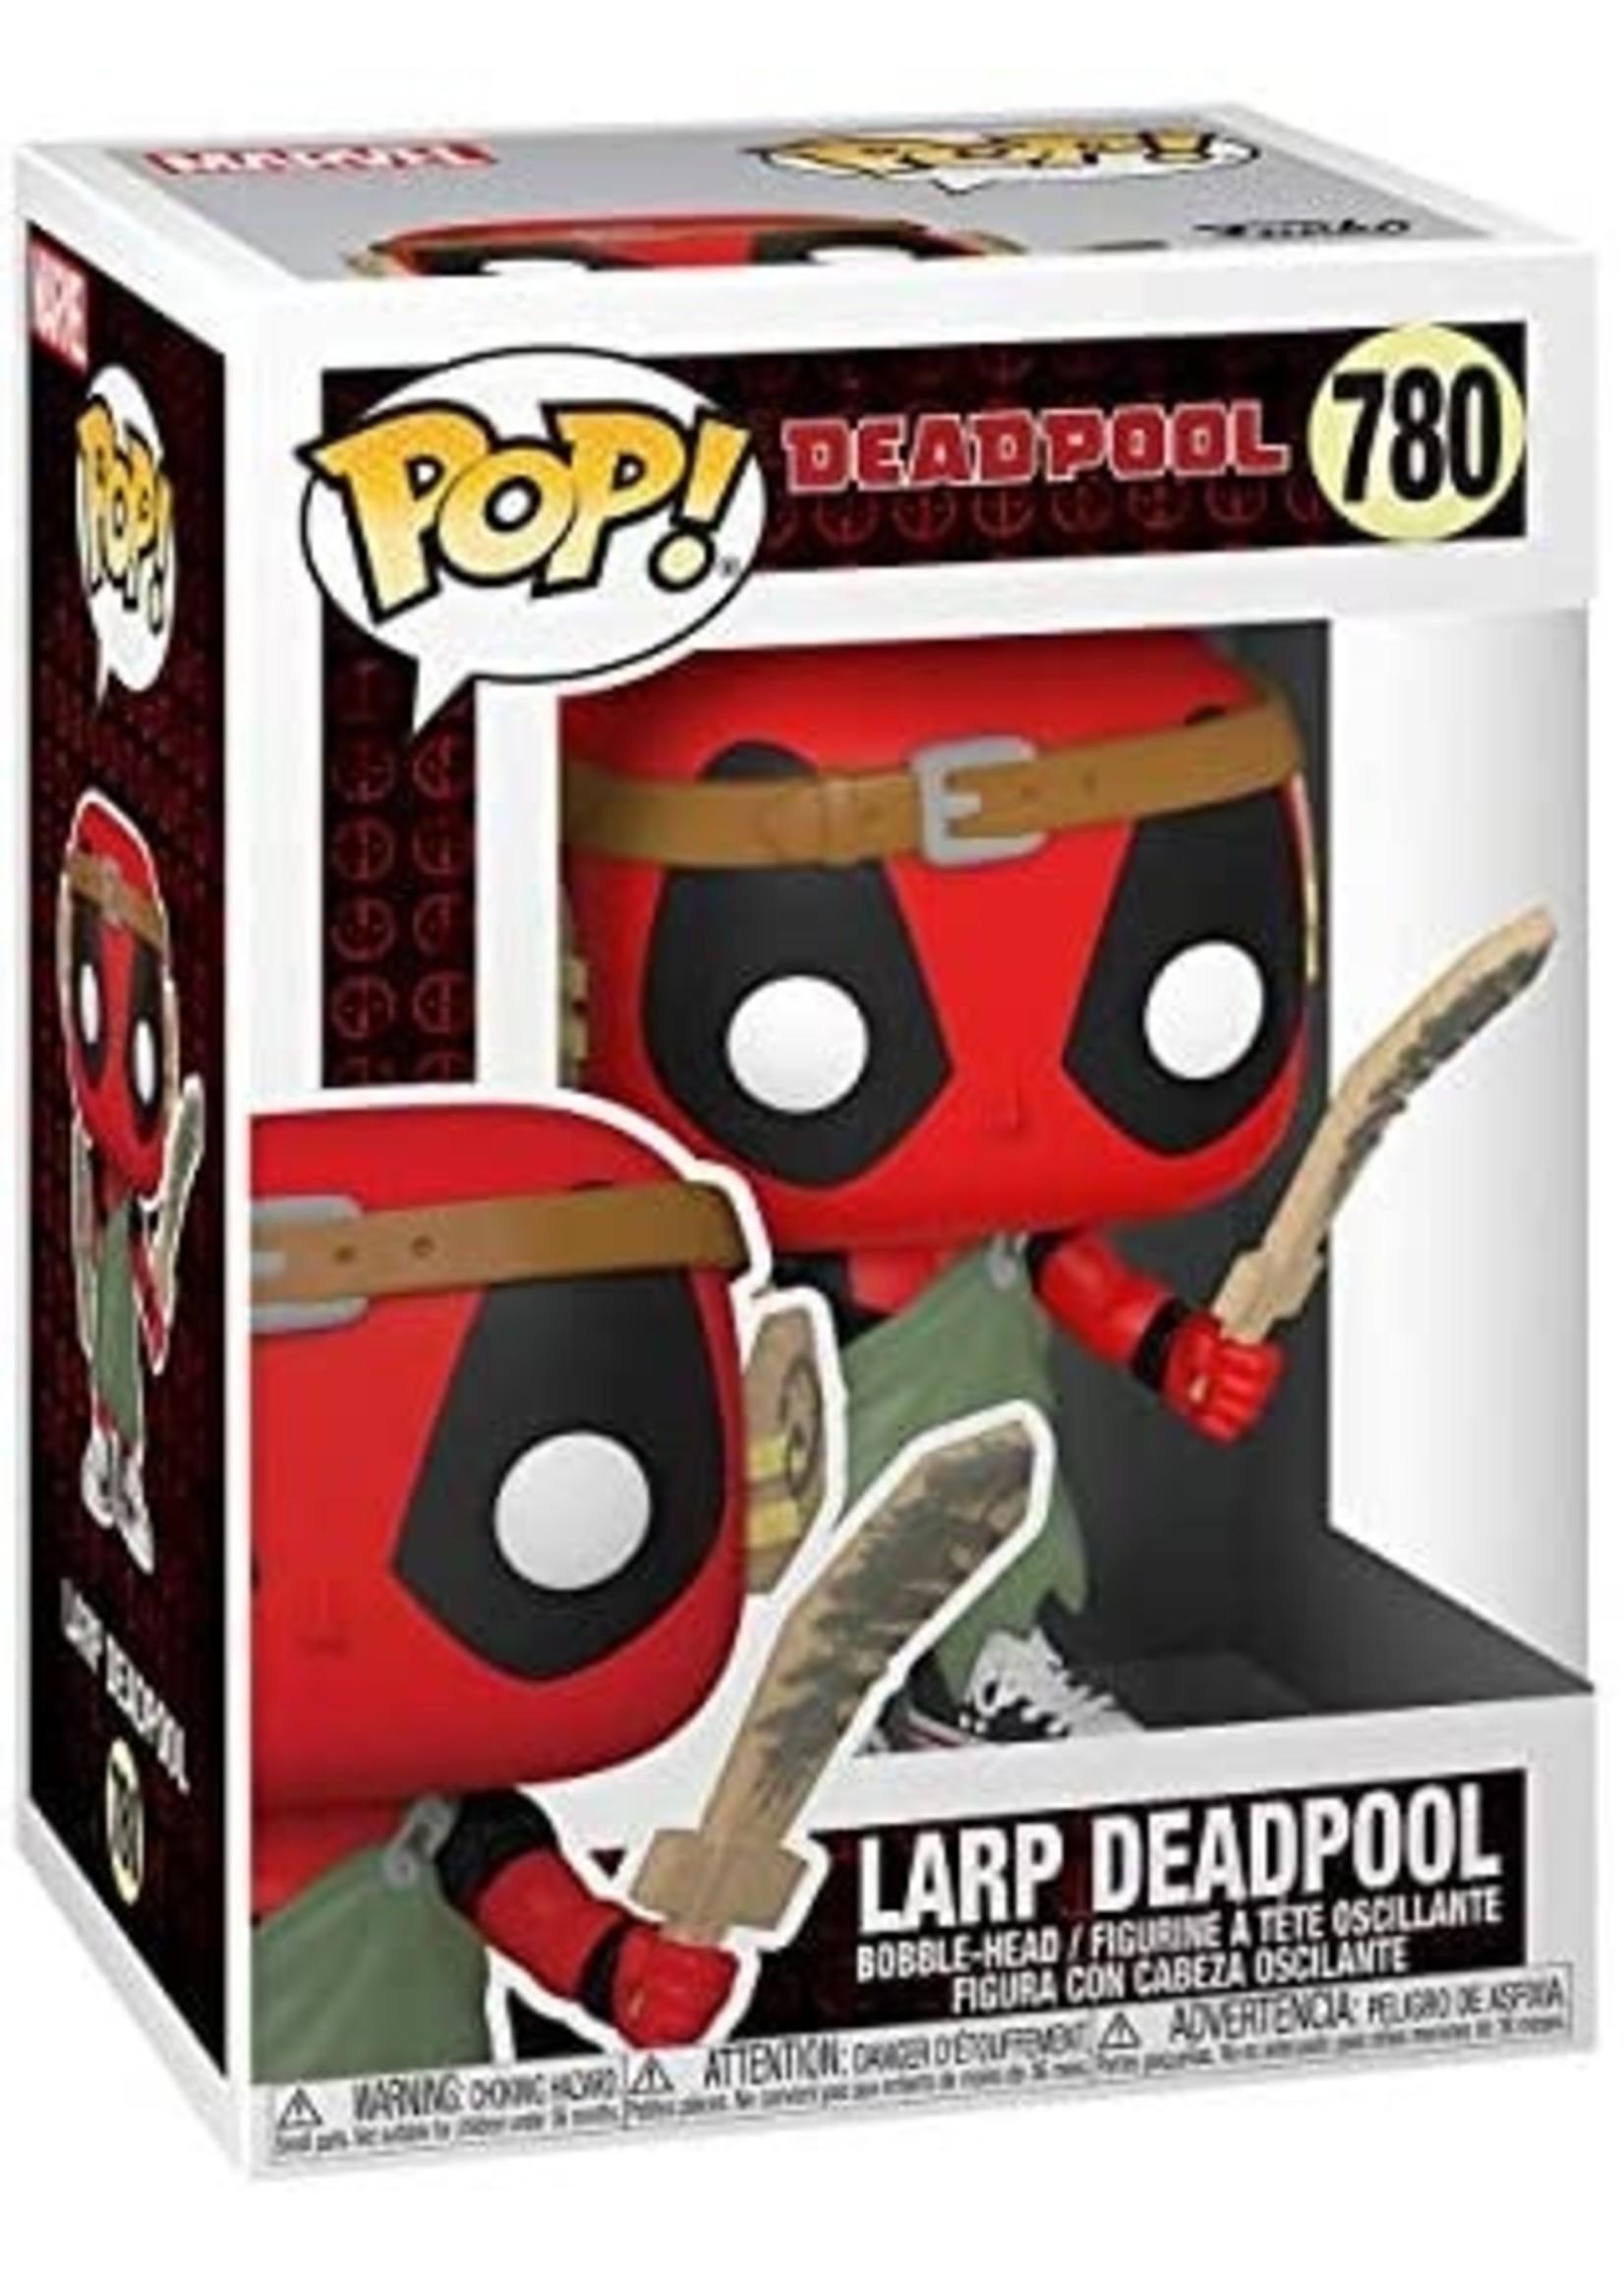 Larp Deadpool